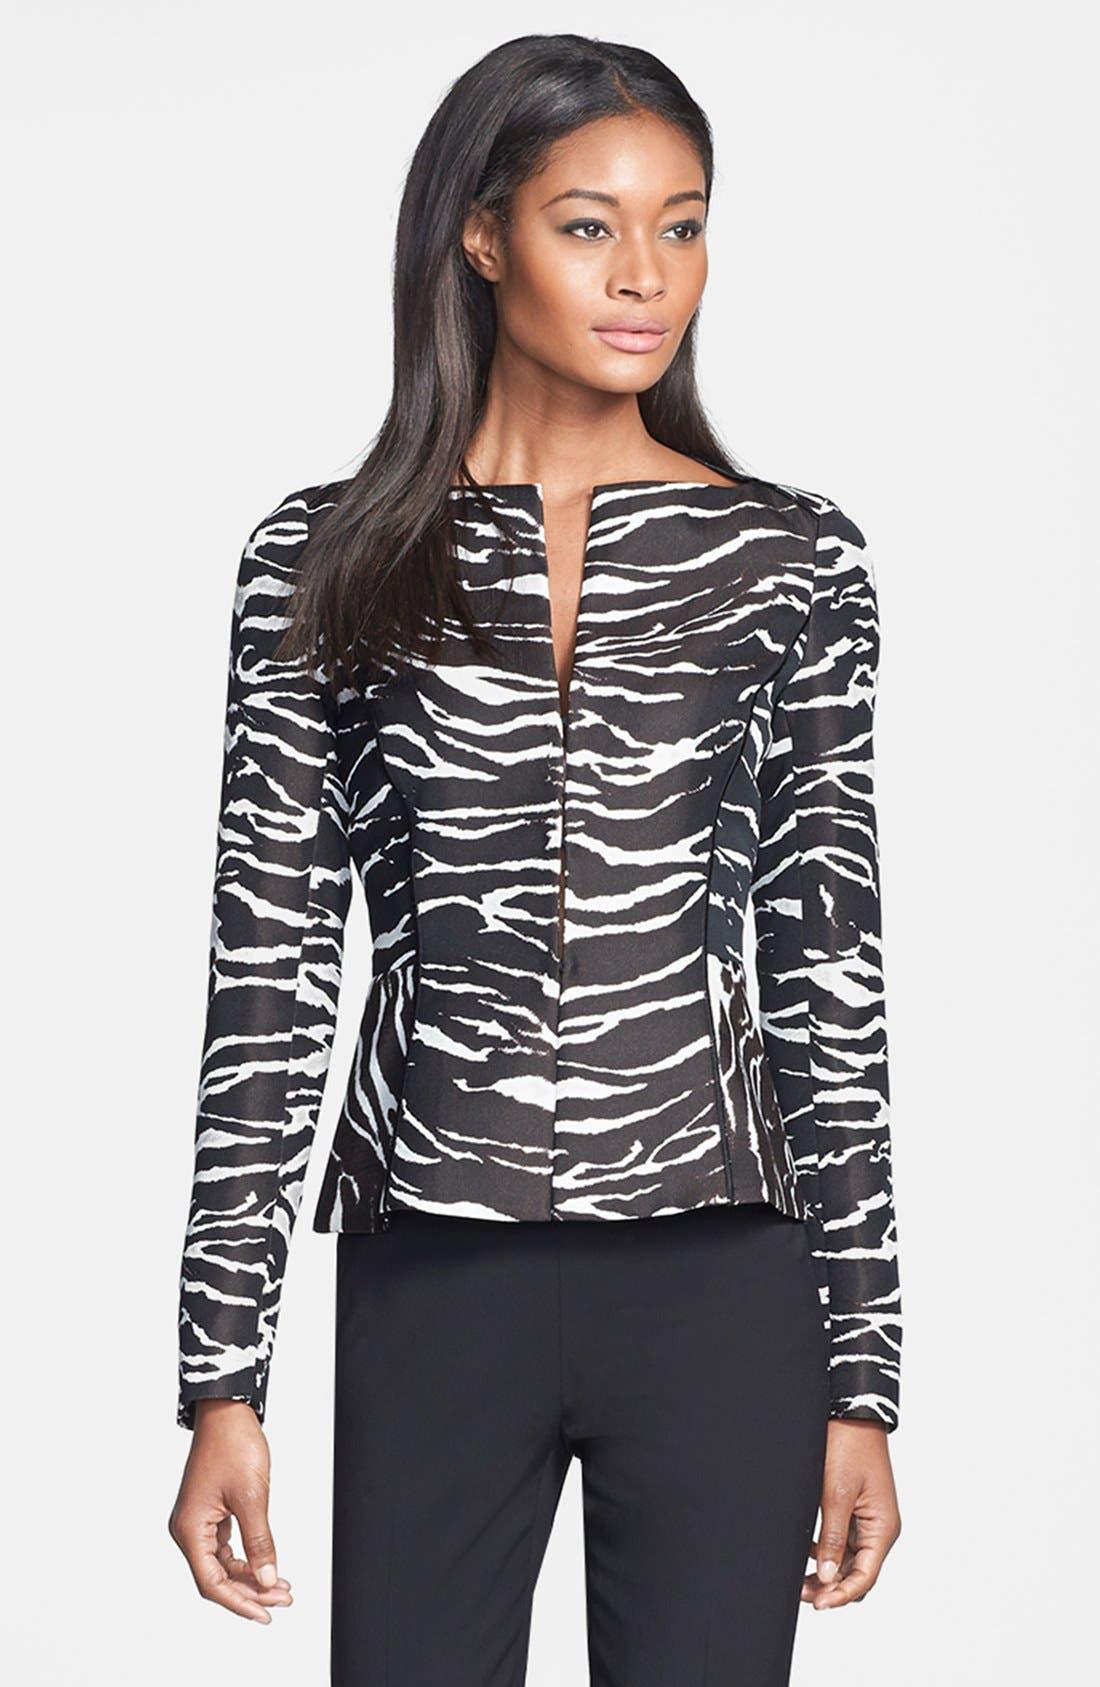 Alternate Image 1 Selected - Lafayette 148 New York 'Graphic Zebra' Jacket